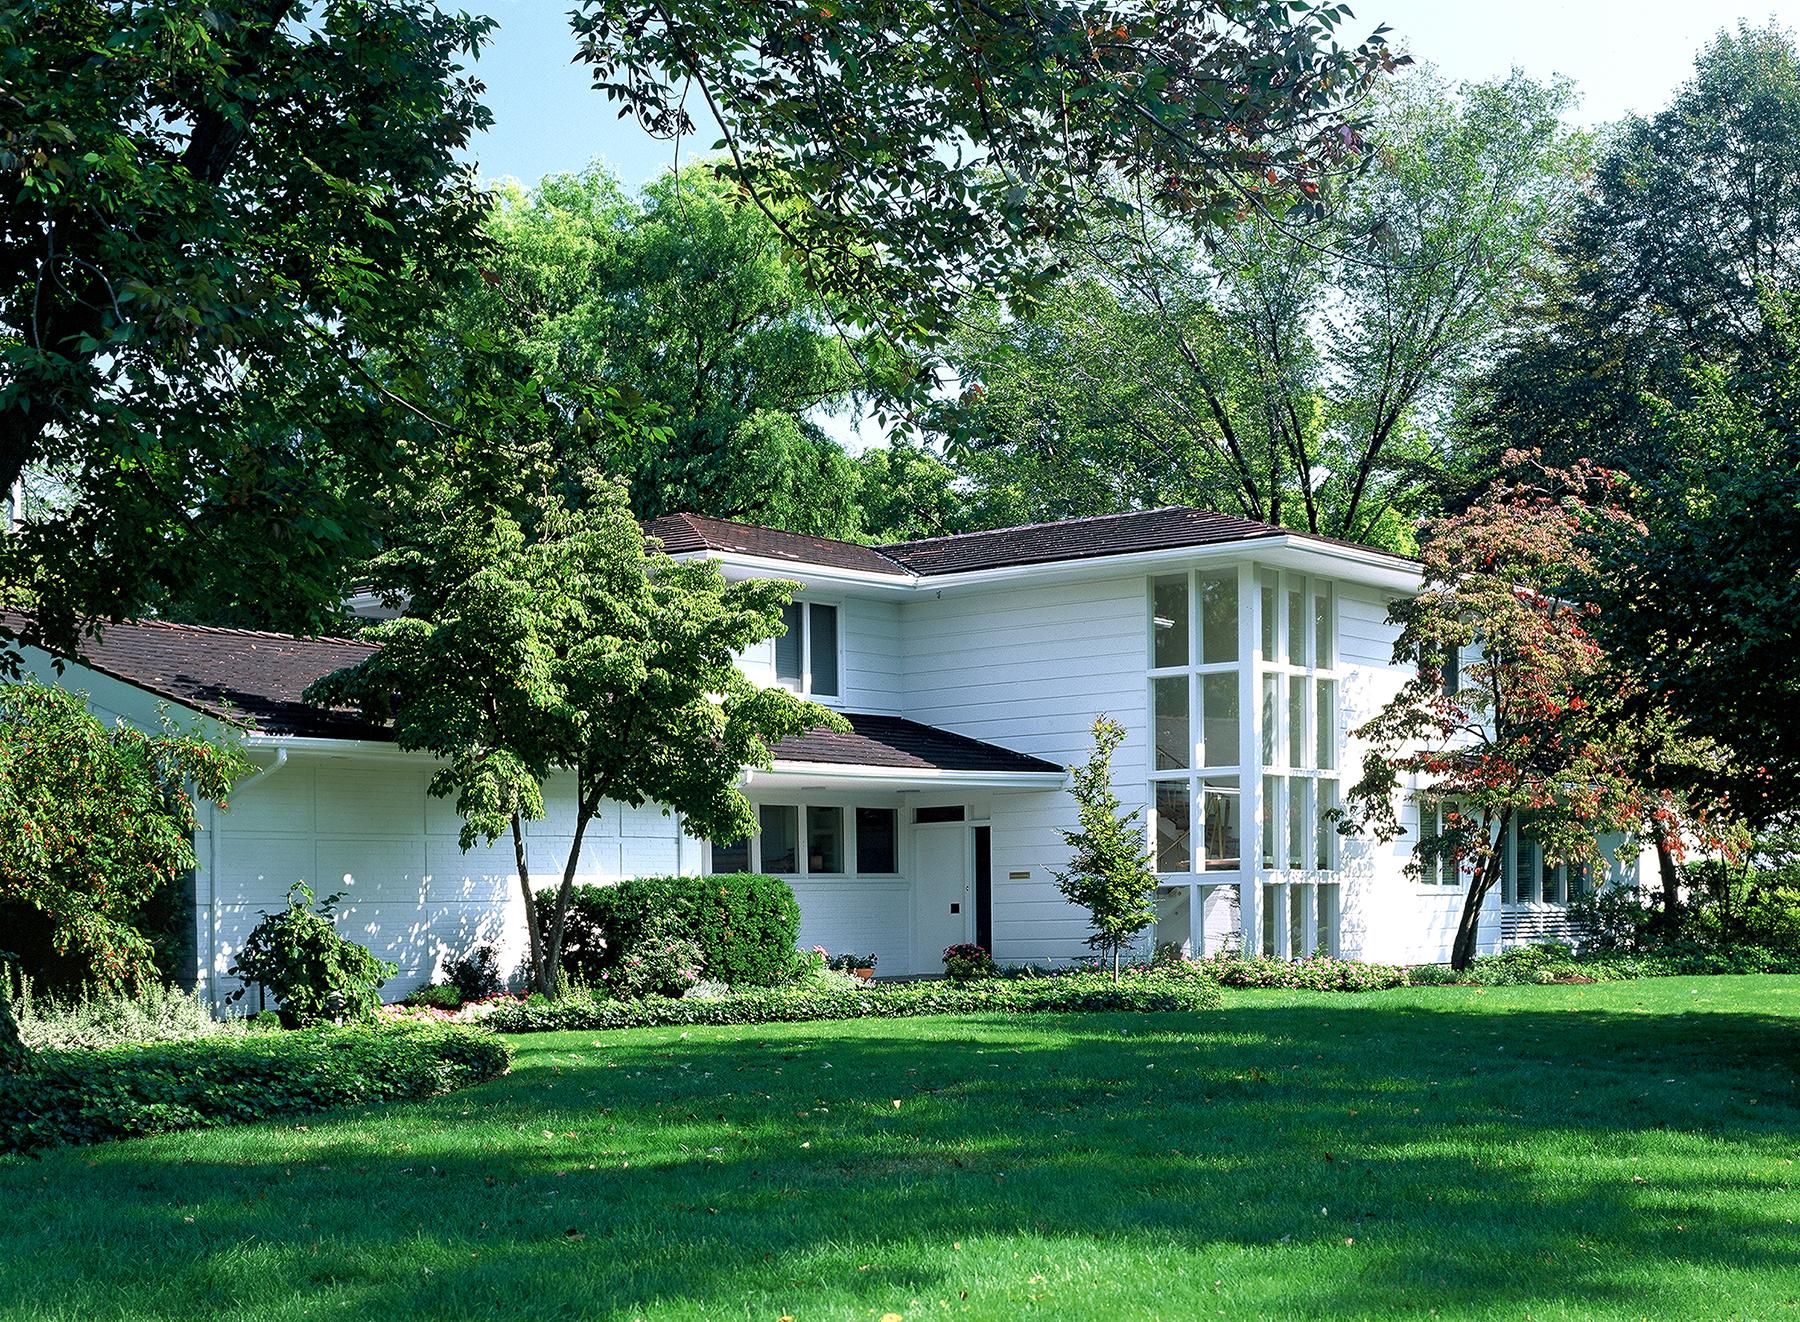 1955 Kendis Residence